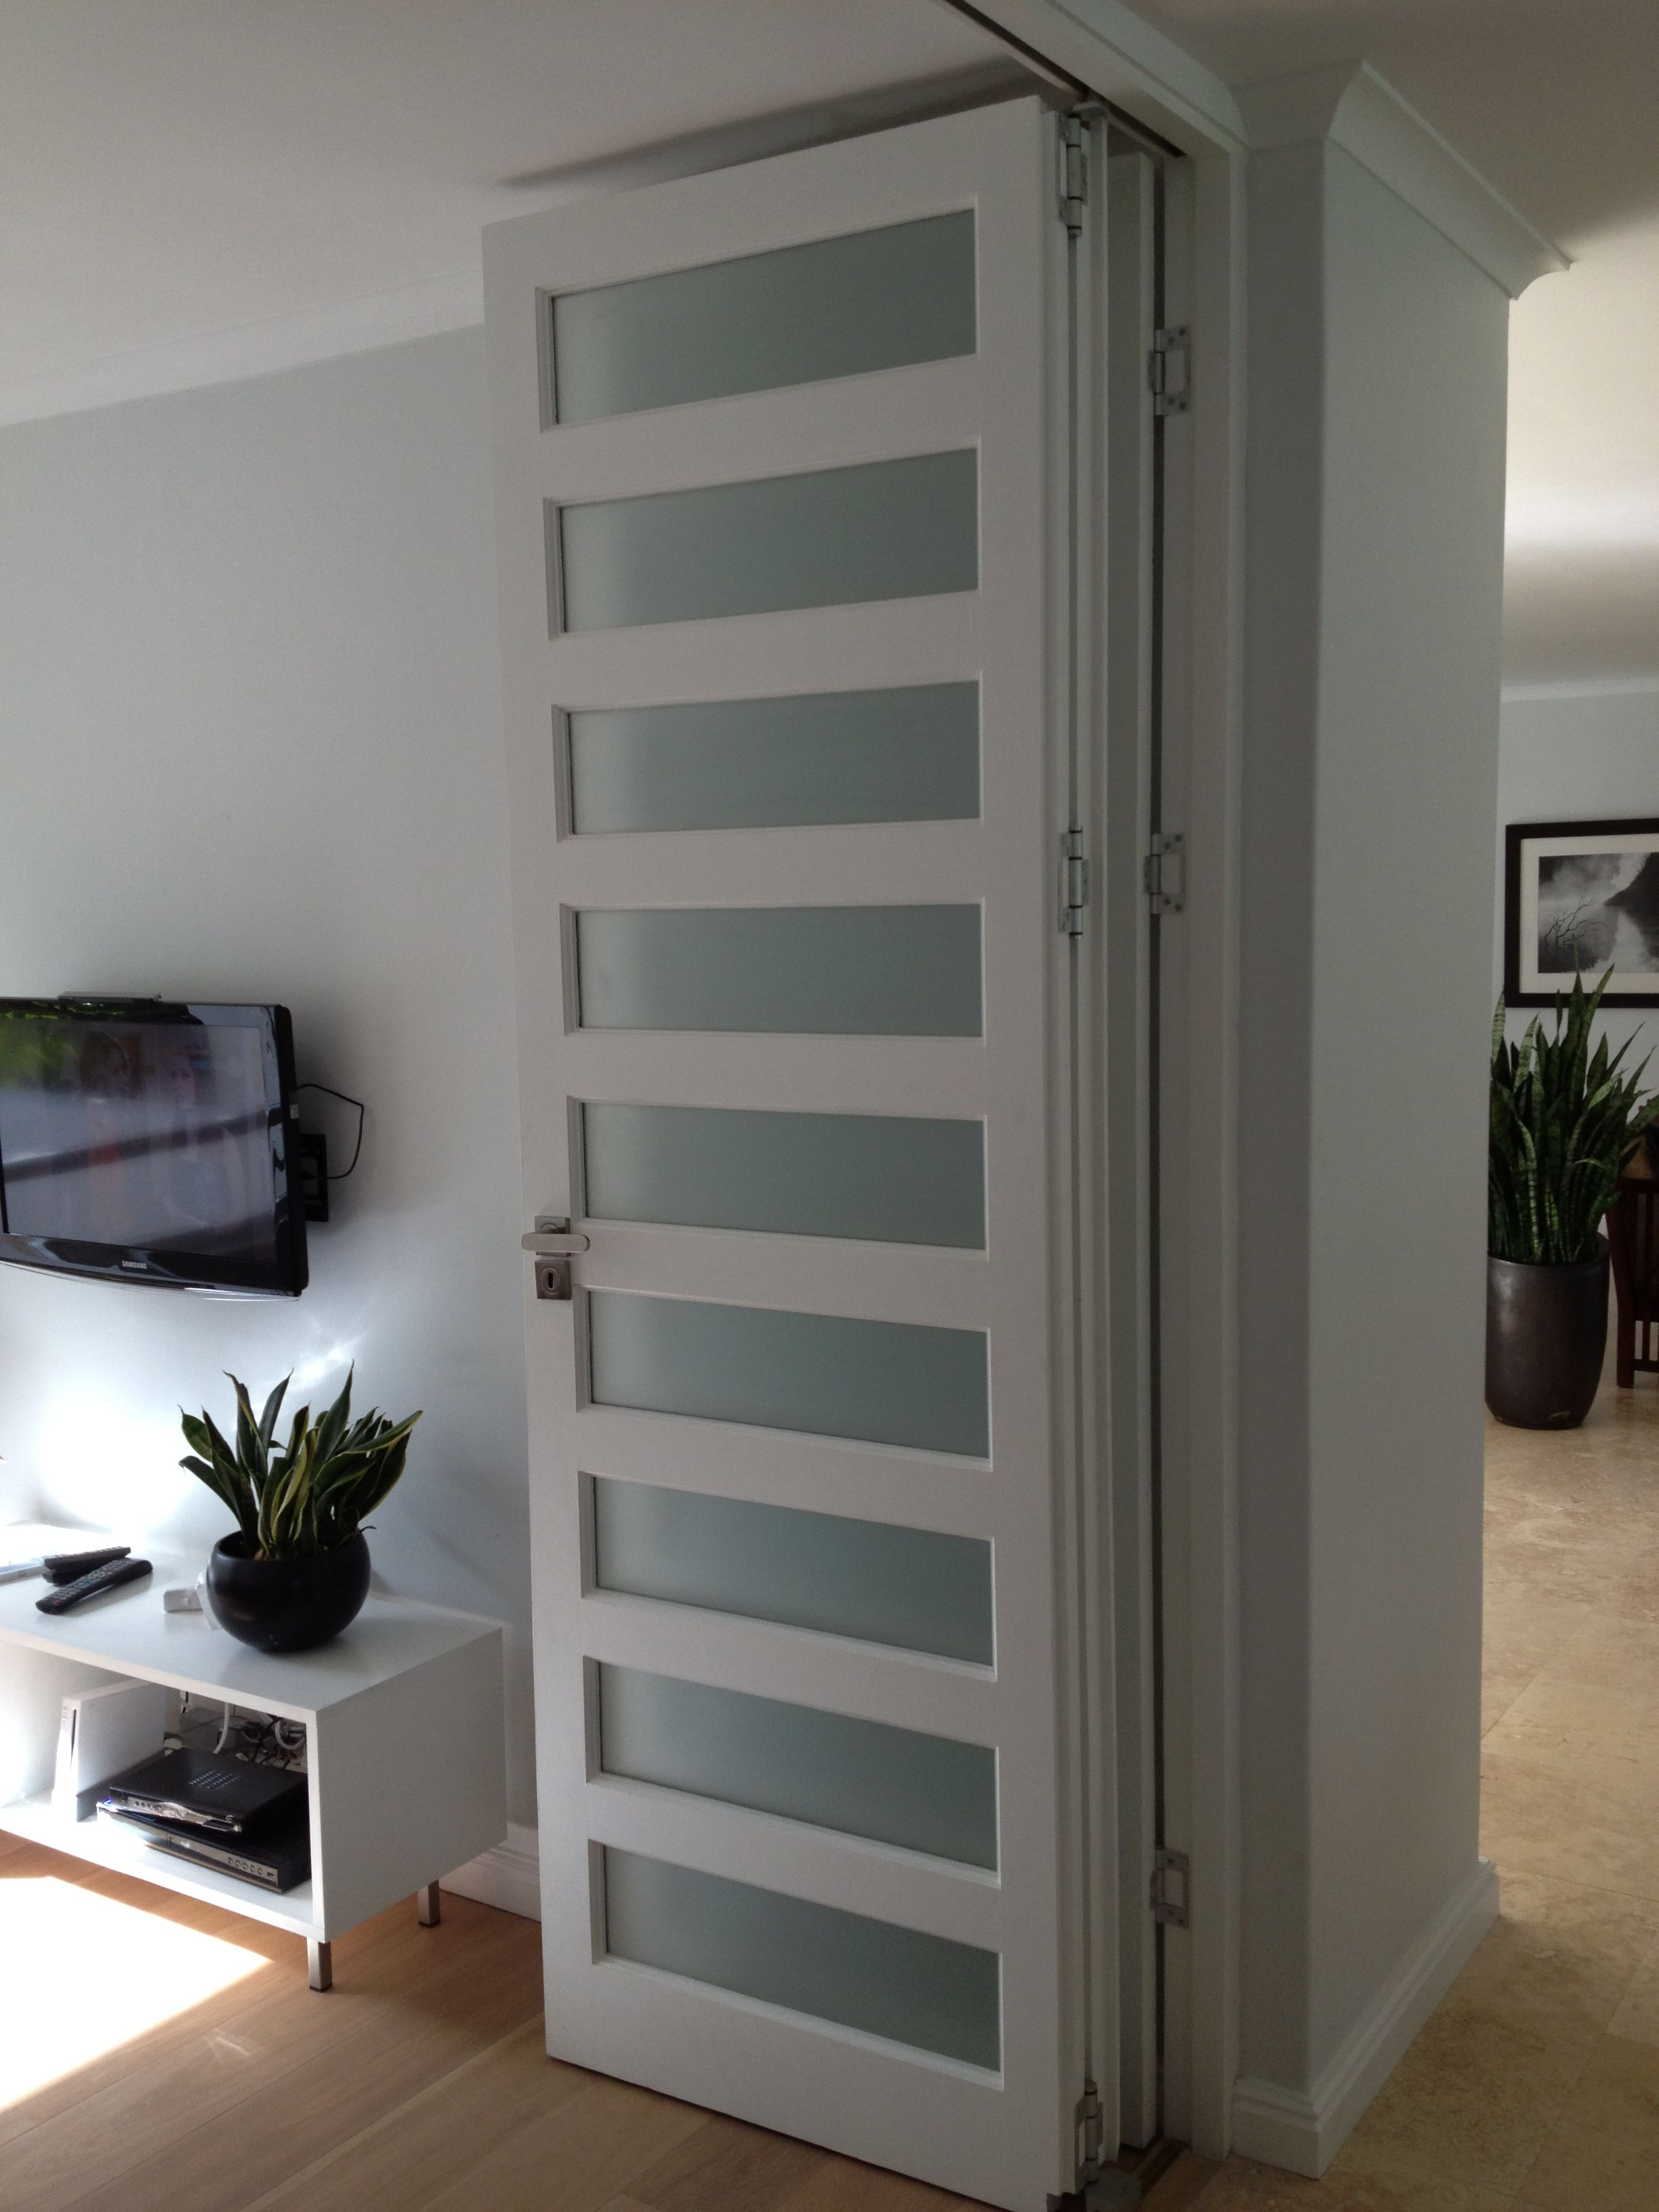 best accordion room dividers ideas basement pinterest